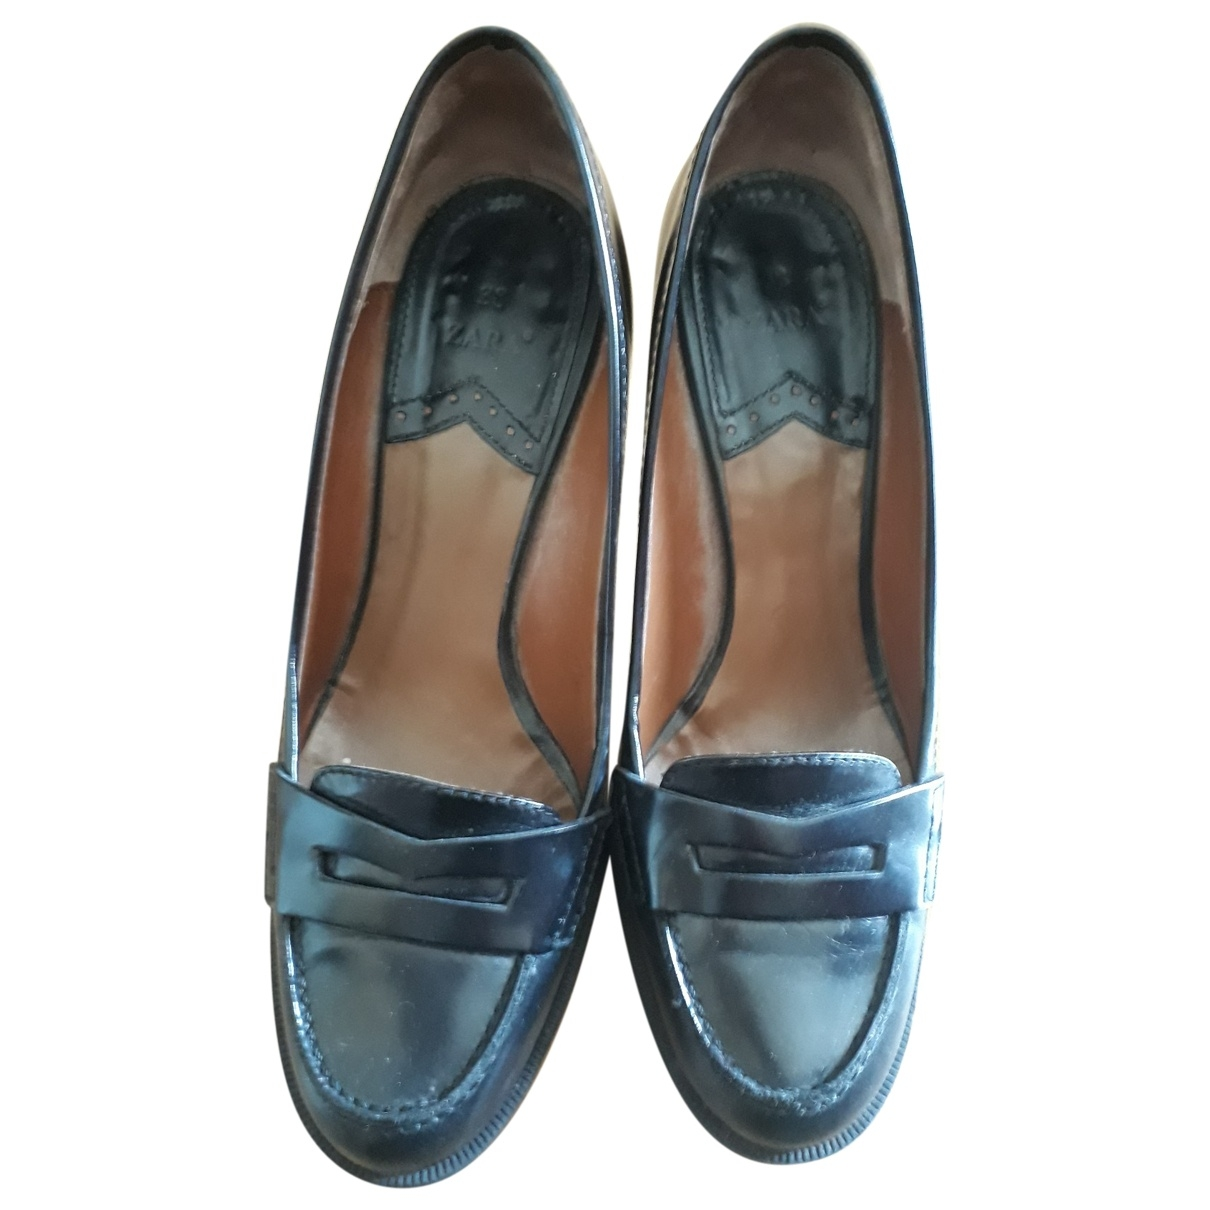 Zara \N Black Leather Flats for Women 38 EU